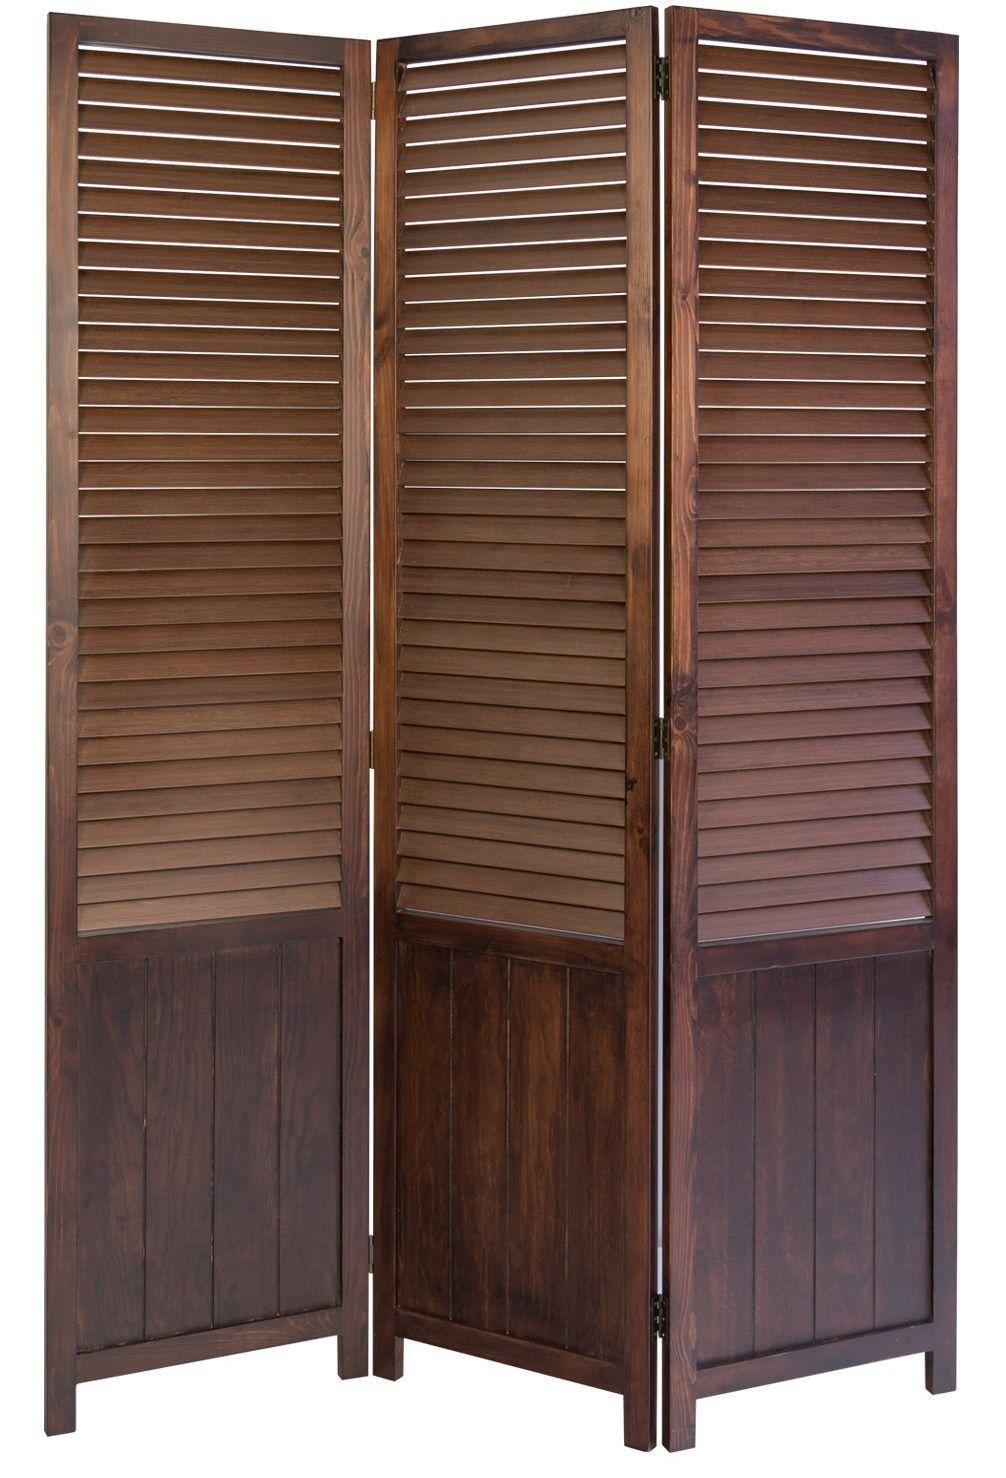 Venetian wooden room divider screen dark brown room divider